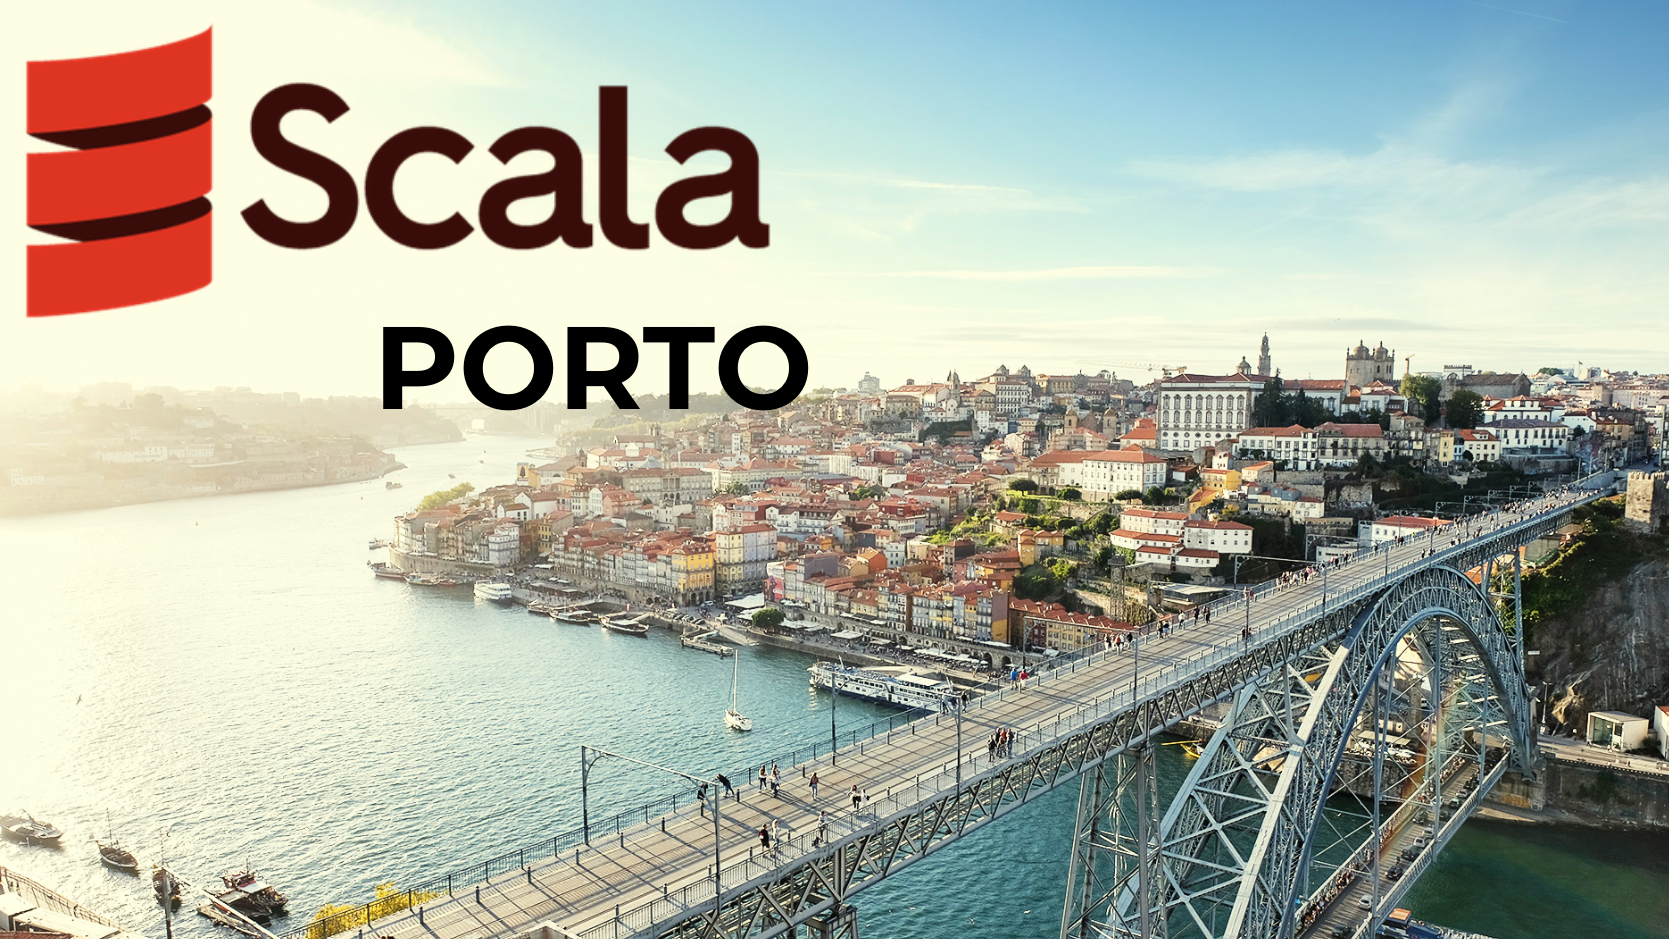 Scala Porto